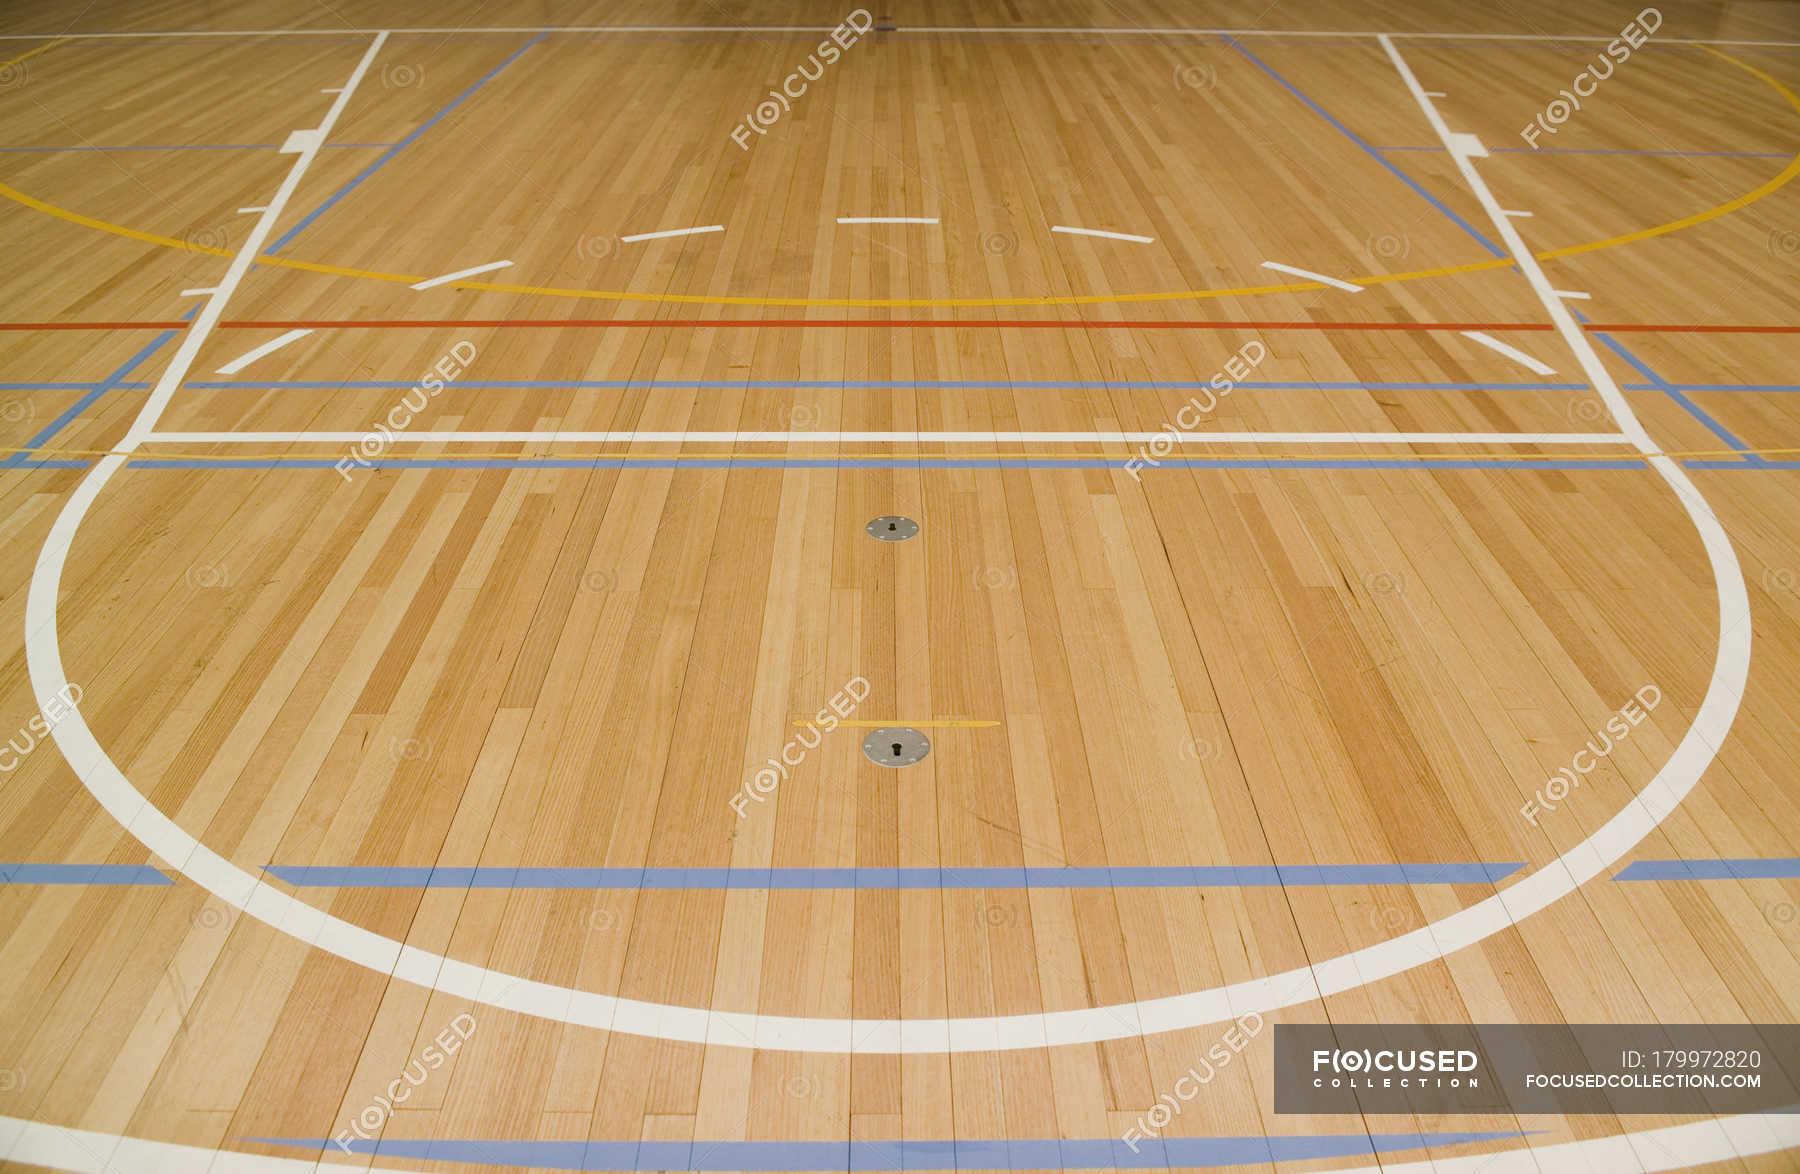 pictures court iphone background wallpaper basketball for floors px desktop hd floor